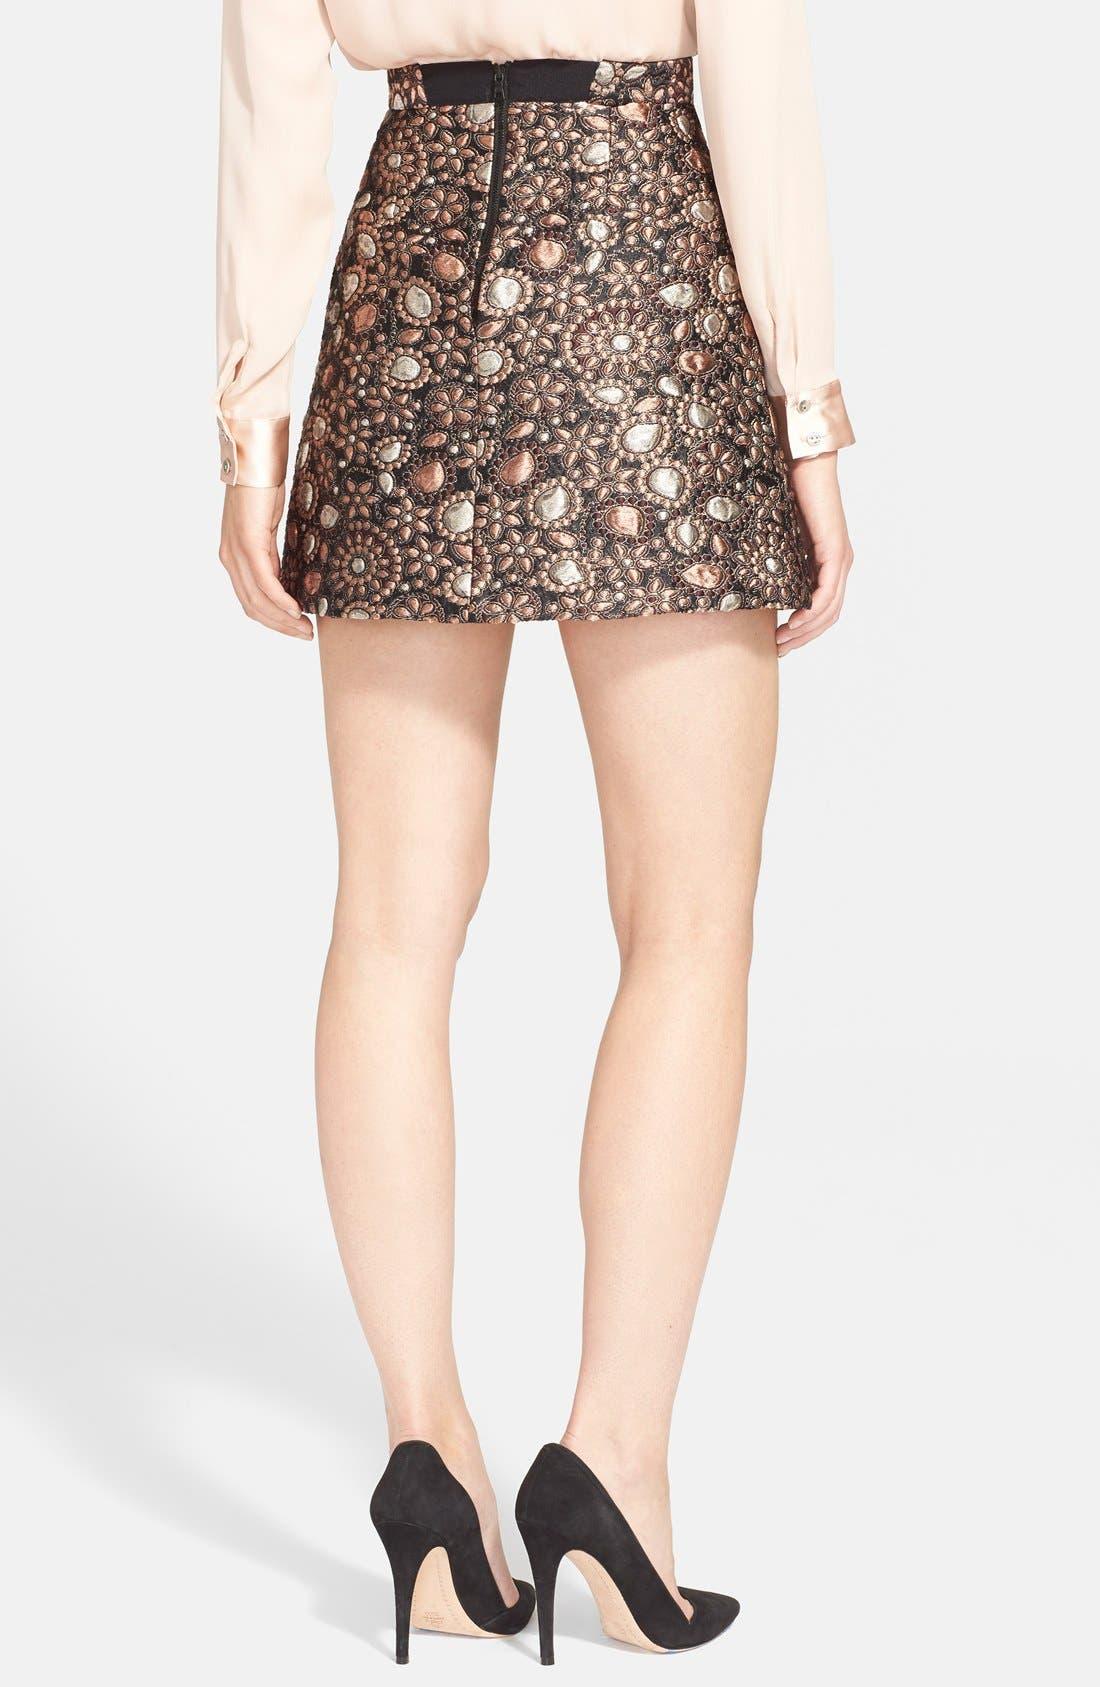 ALICE + OLIVIA, 'Jessa' A-Line Skirt, Alternate thumbnail 2, color, 716